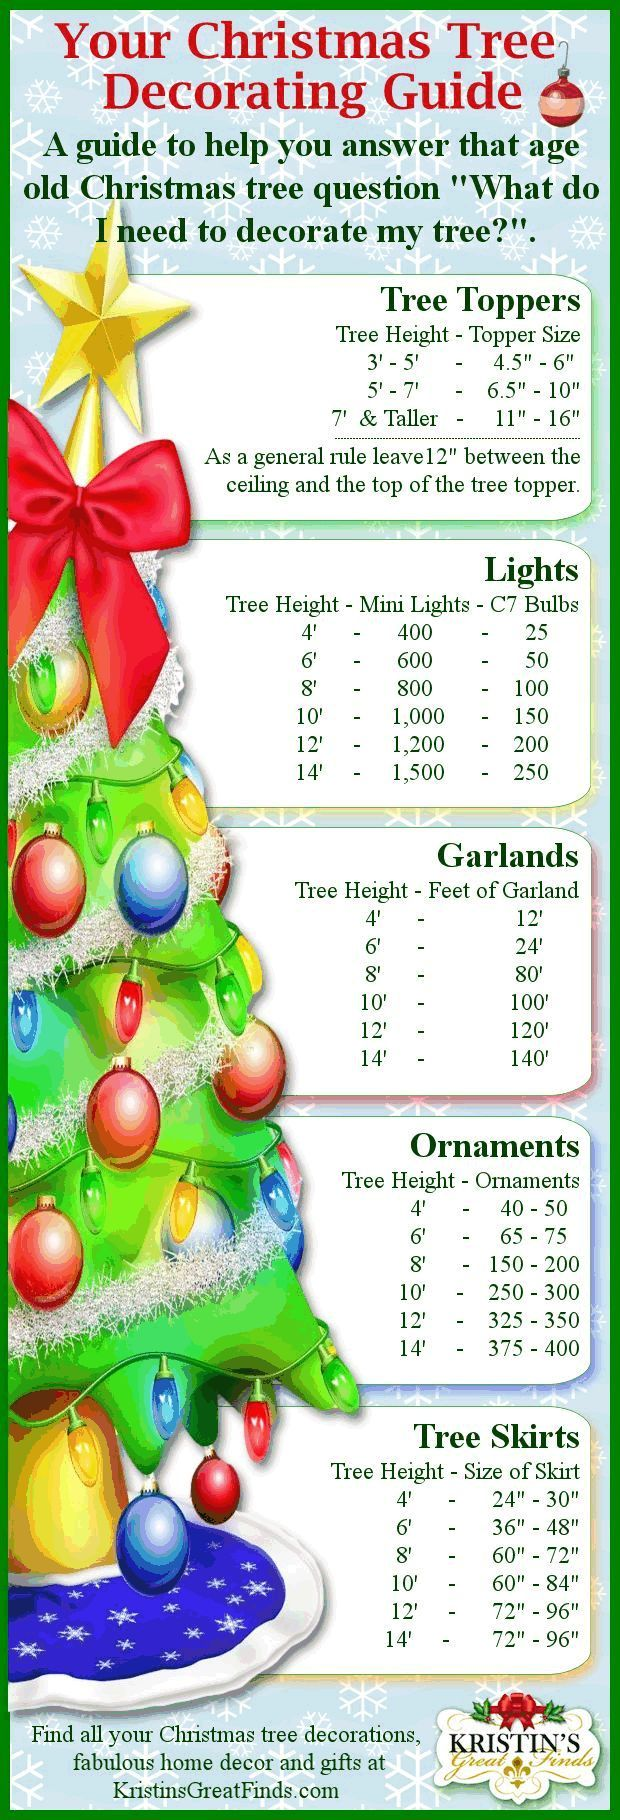 Christmas Ideas: Christmas Tree Decorating Guide